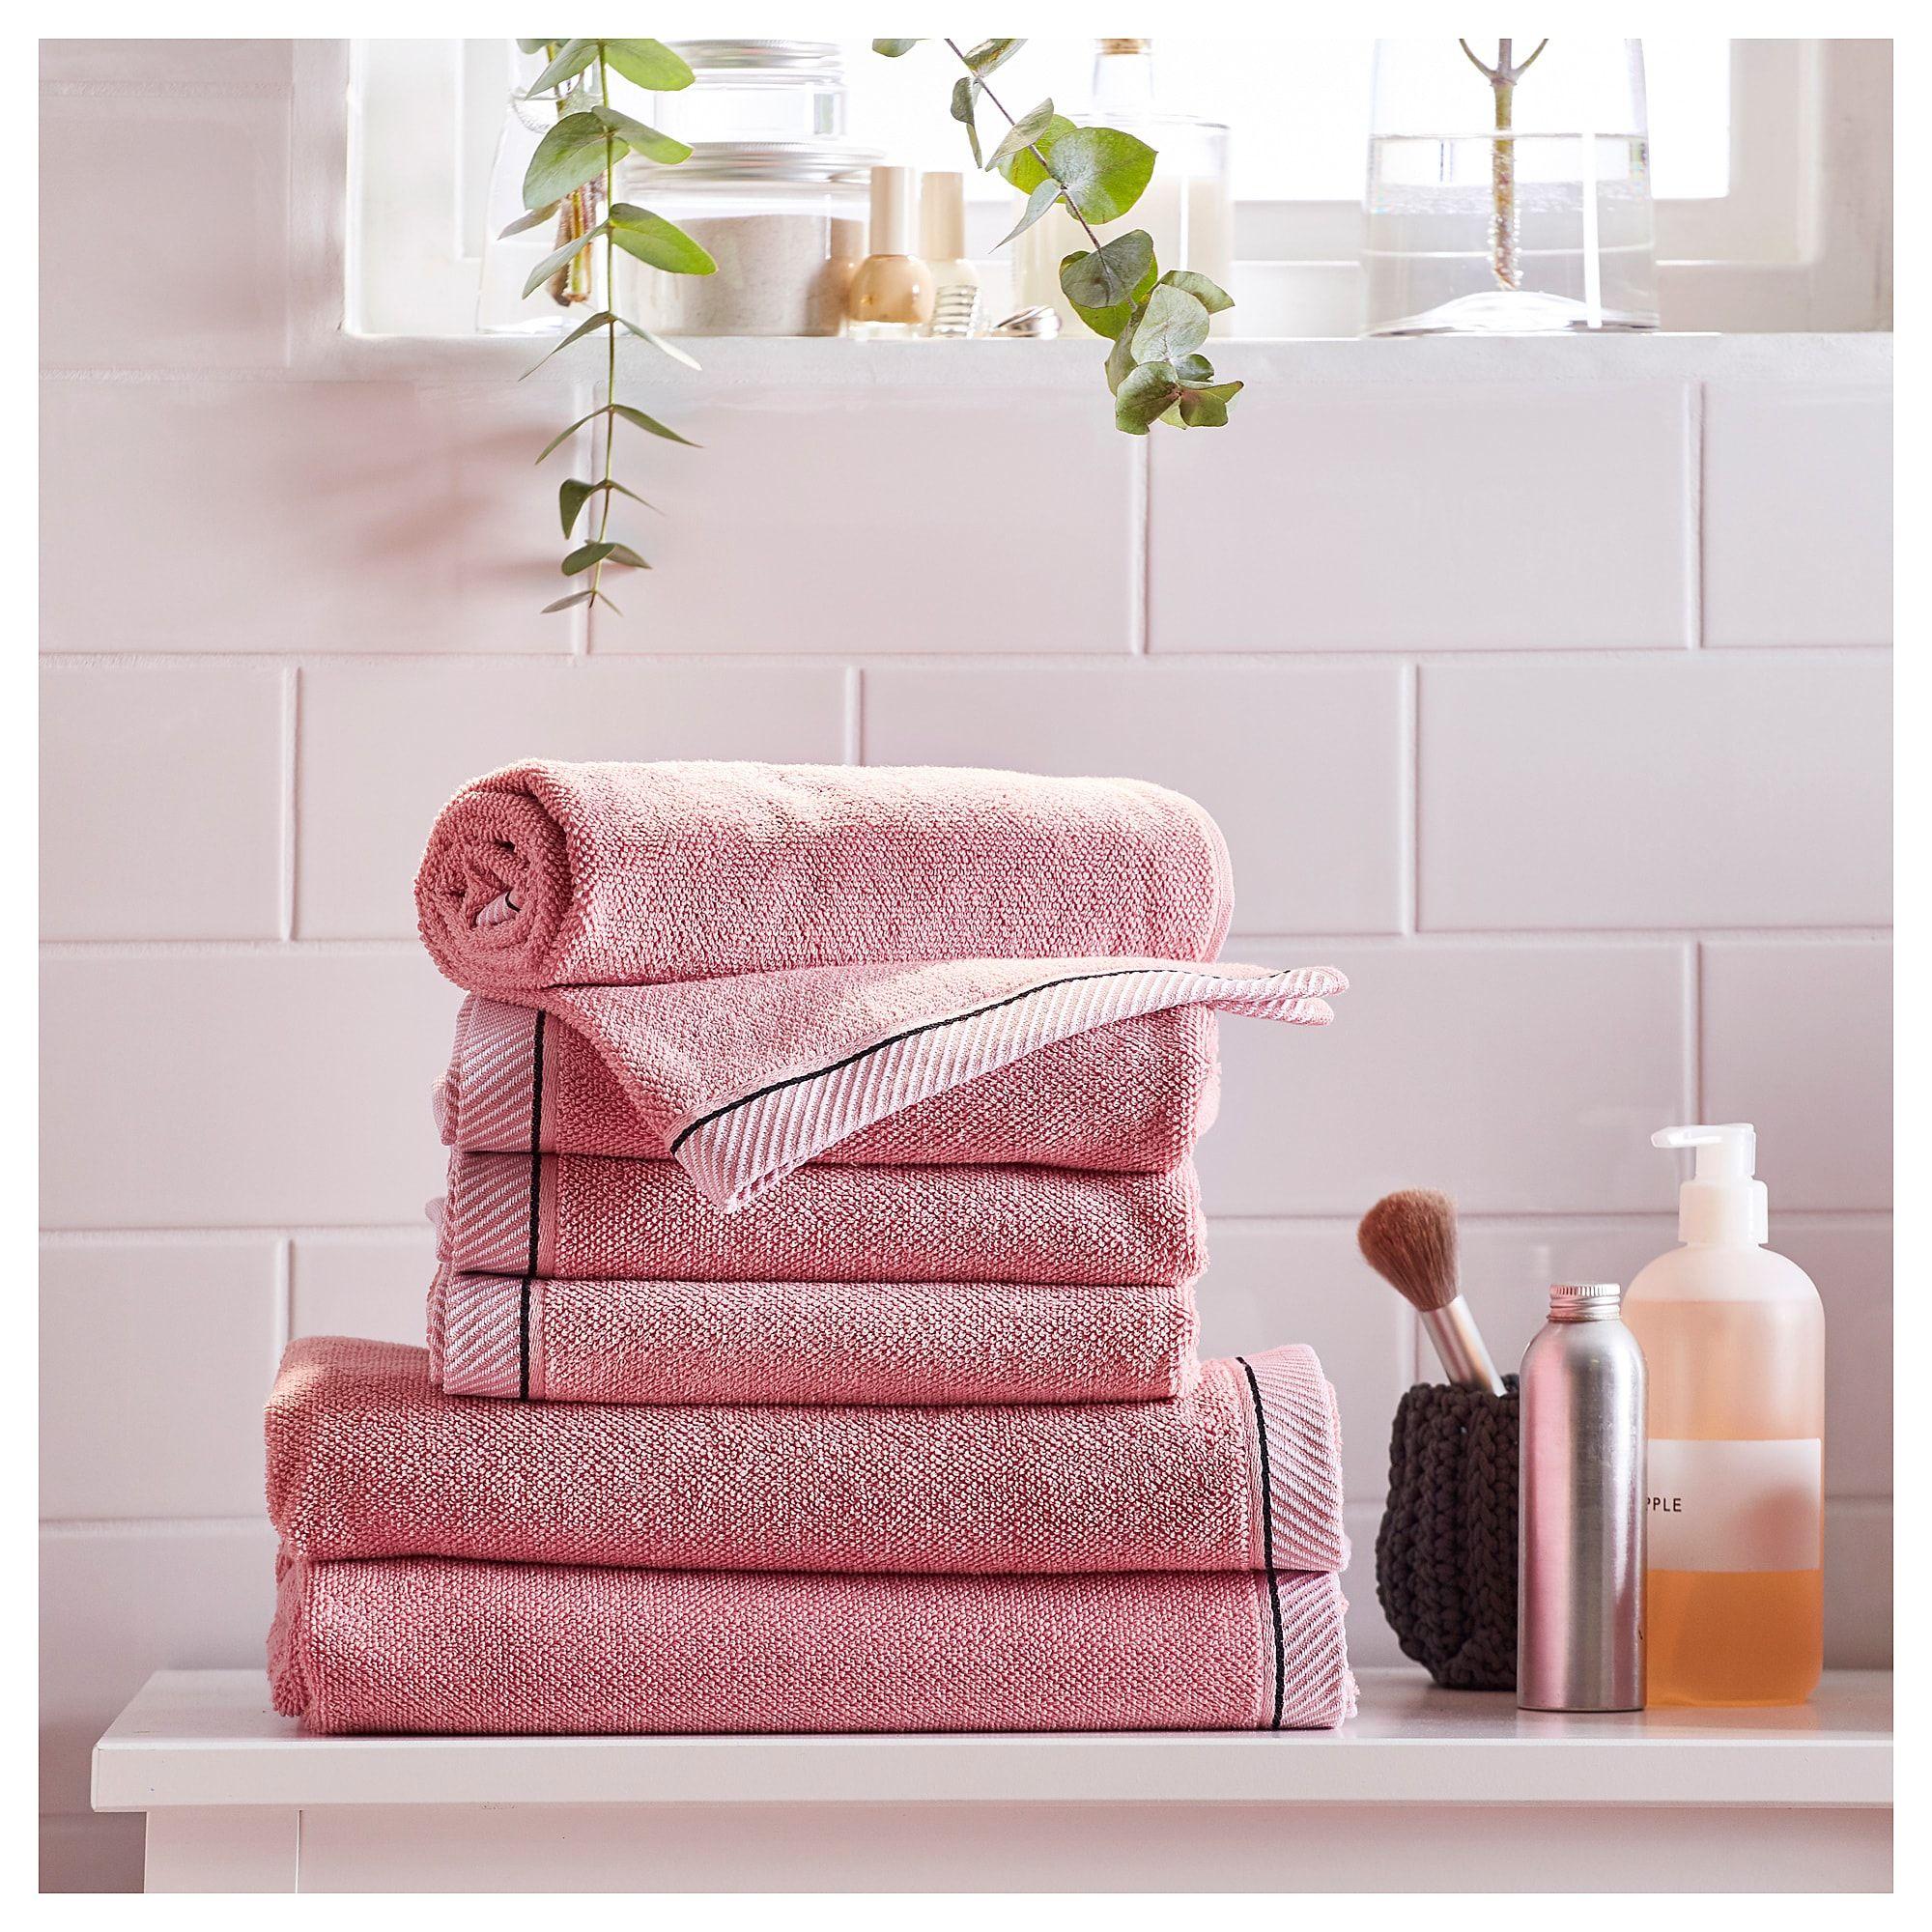 Vikfjard Bath Towel Pink 28x55 With Images Towel Bath